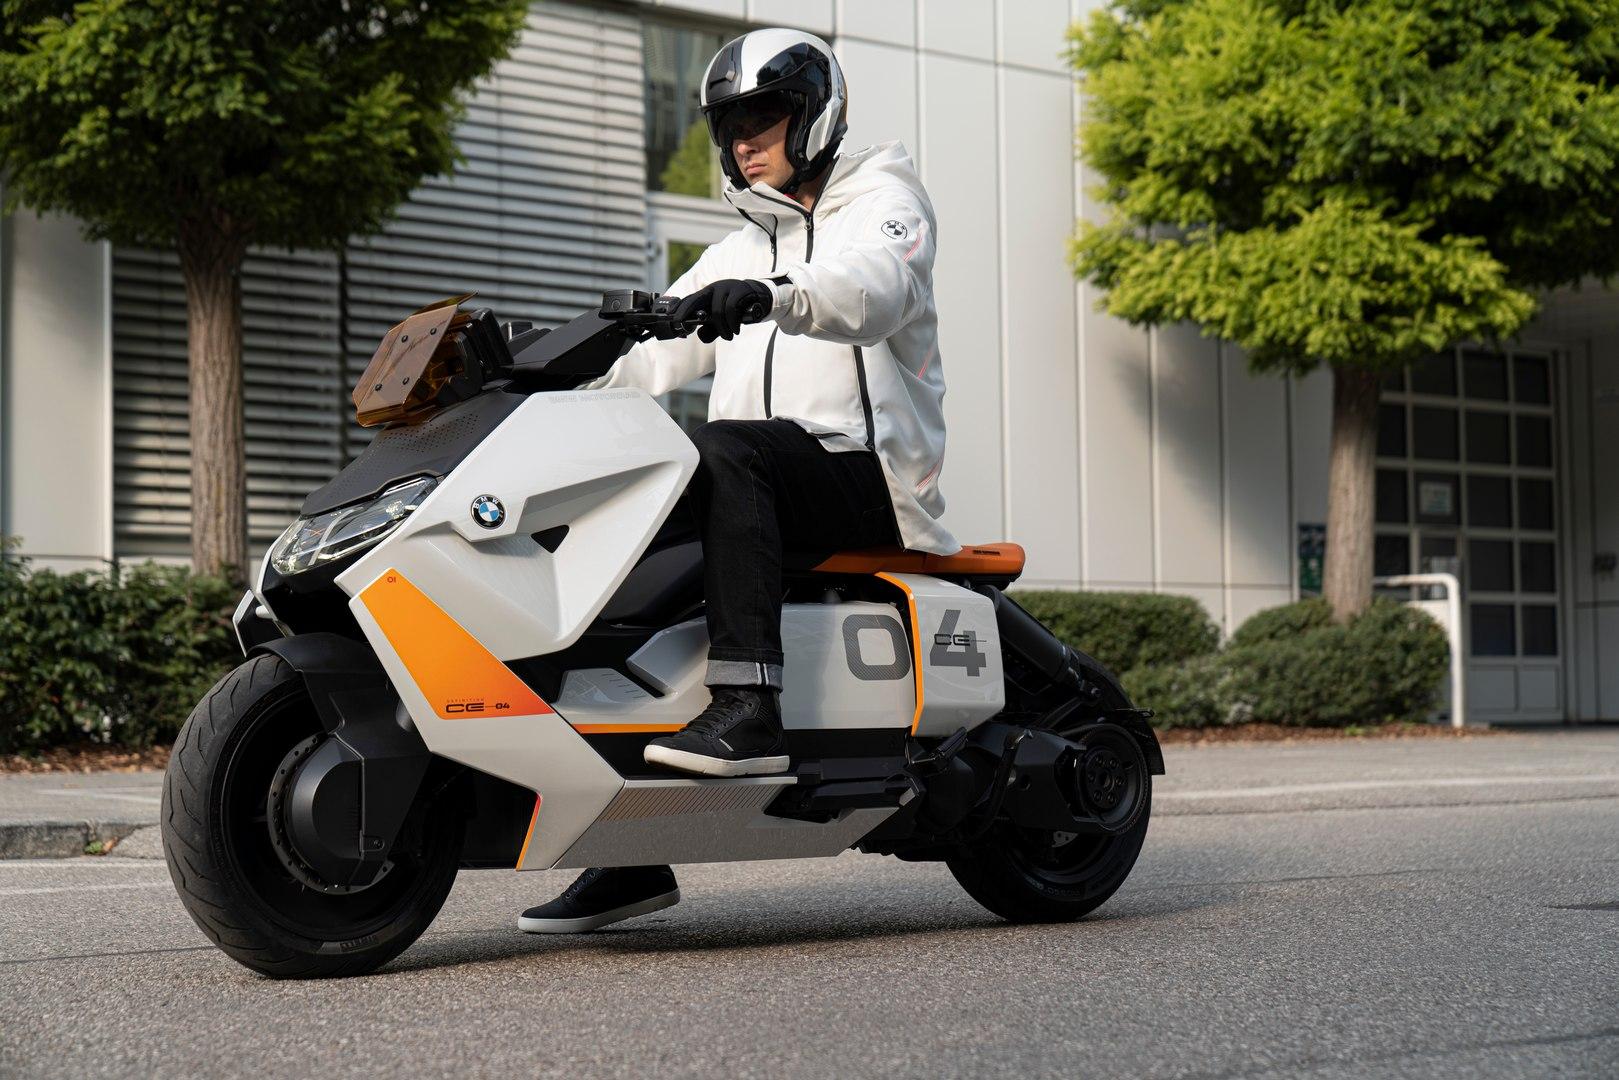 BMW Motorrad Definition CE 04 - Νέο ηλεκτρικό scooter ετοιμάζεται για παραγωγή - BIKEIT!